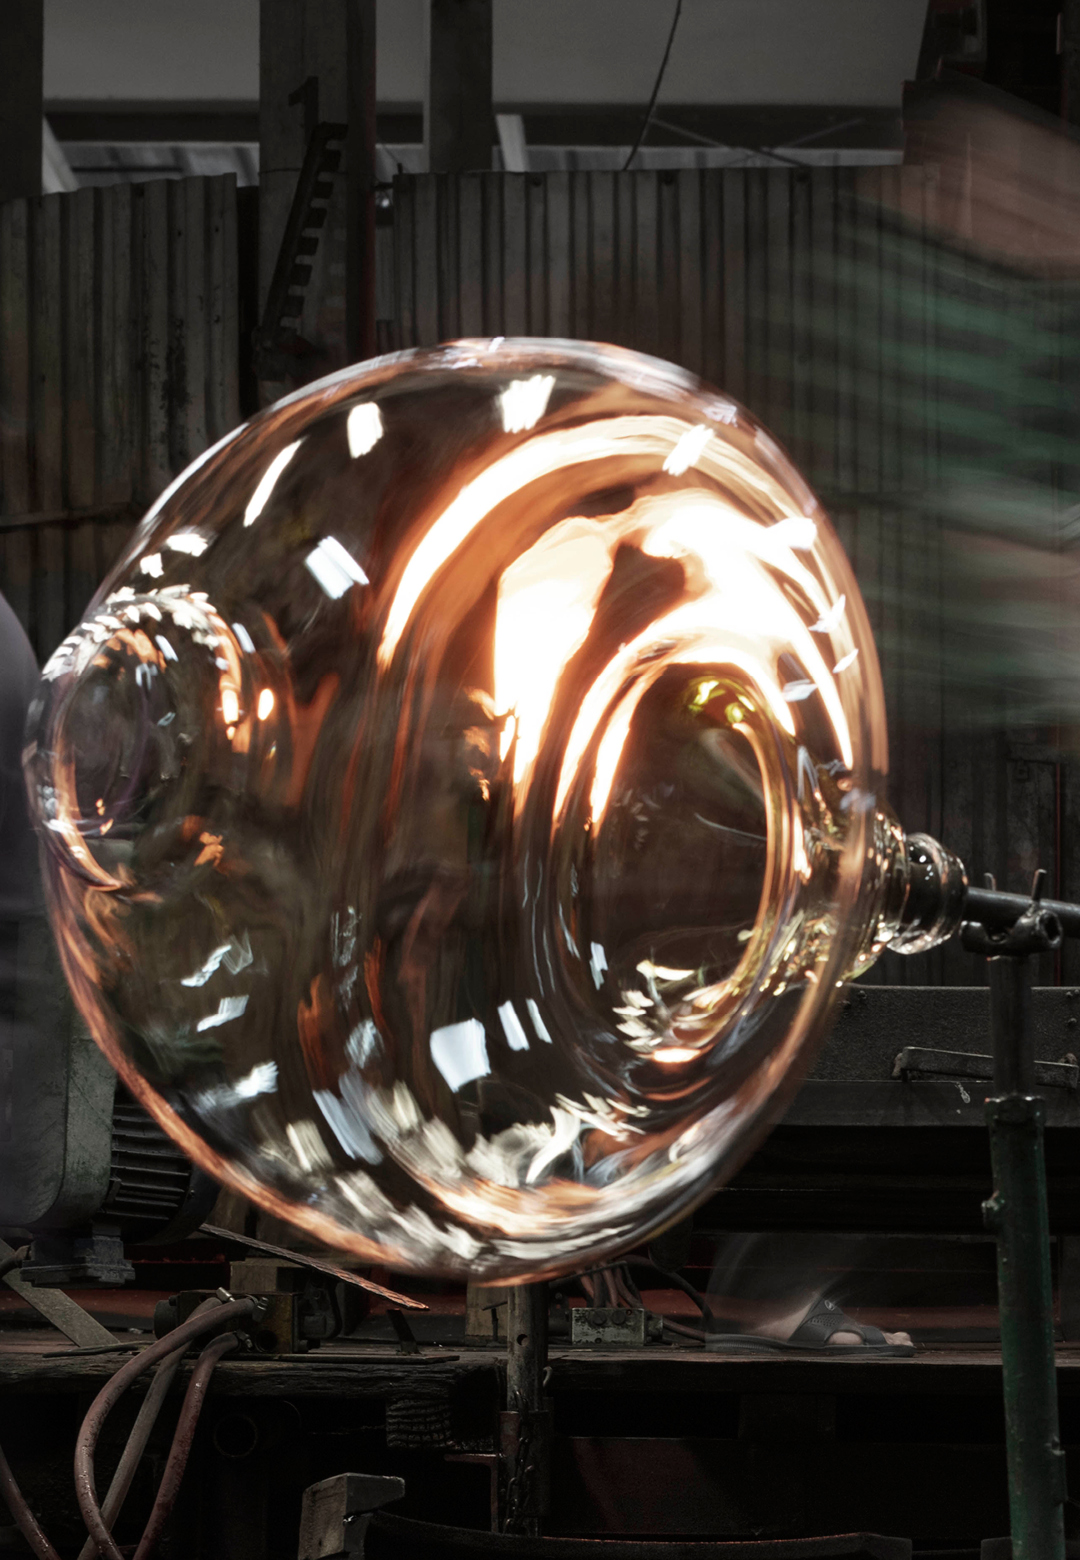 The making of Noctambule collection for Flos| Noctambule| Konstantin Grcic| Flos| STIR